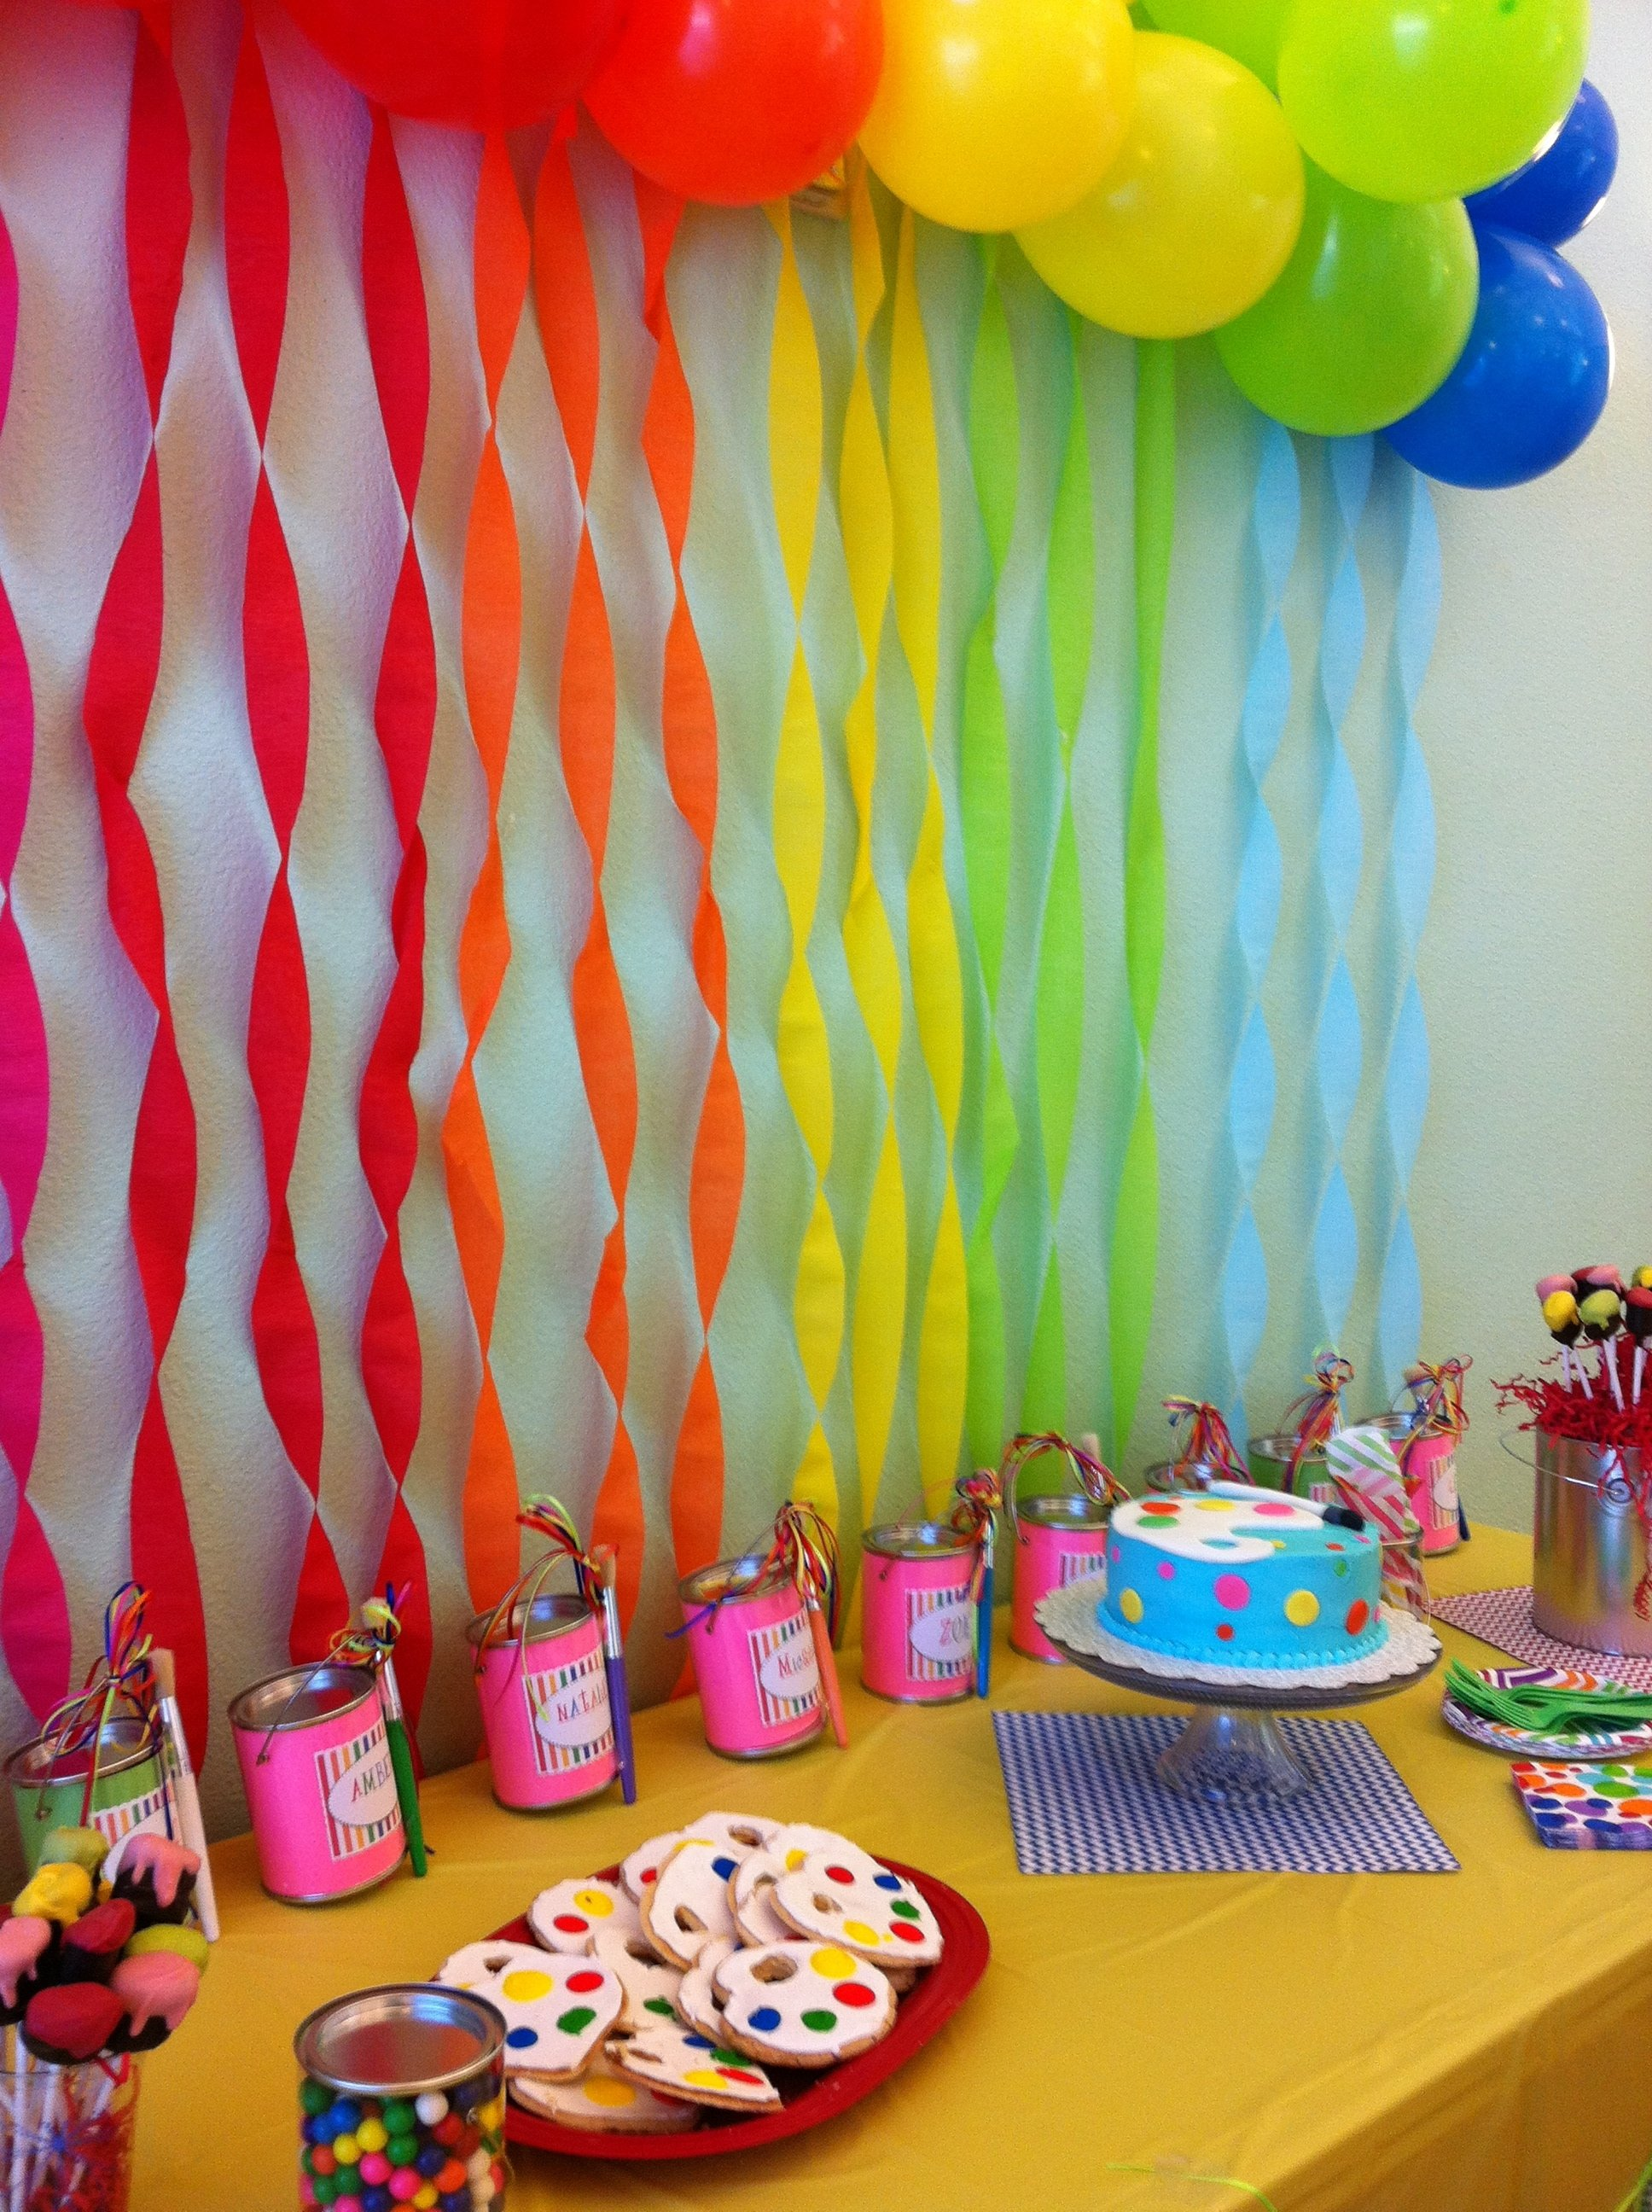 10 Beautiful 4 Year Old Girl Birthday Party Ideas 8 year old girl birthday art party art party pinterest art 28 2020